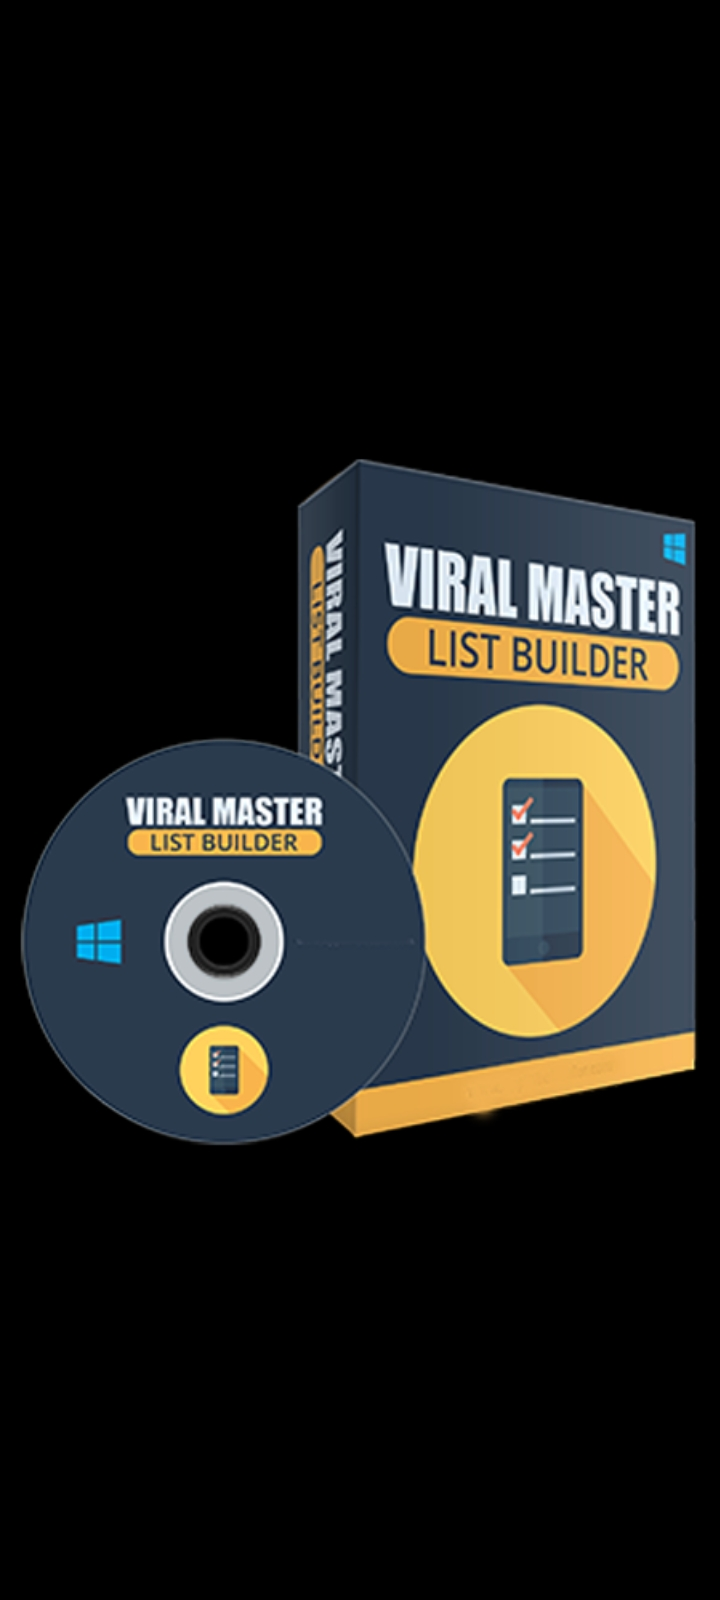 Viral master list builder for email marketing